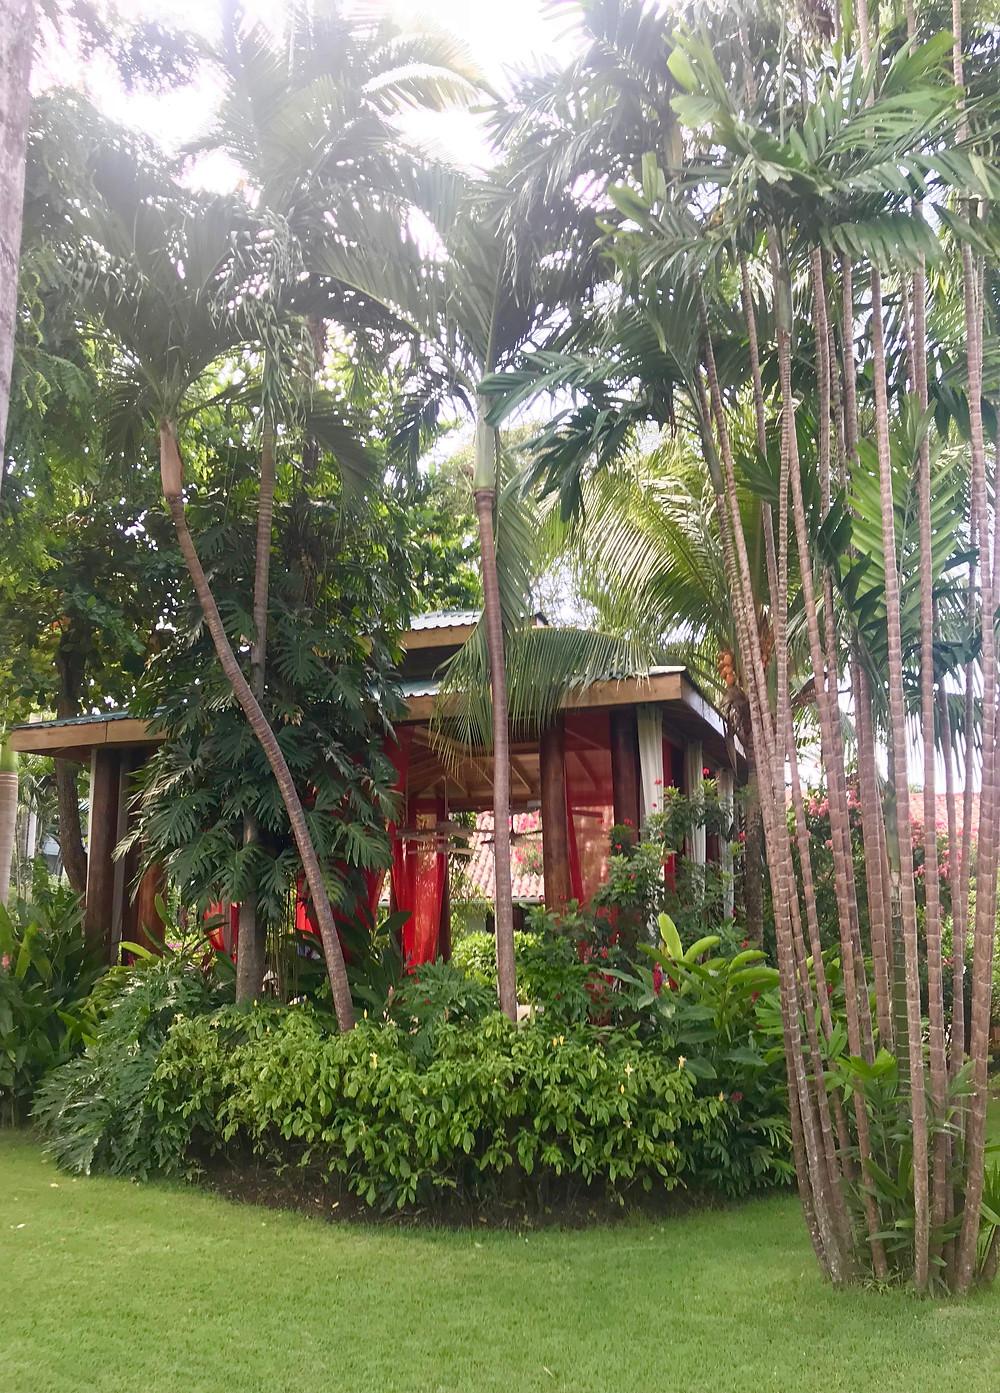 Sandals Royal Barbados Yoga Pavilion - outside